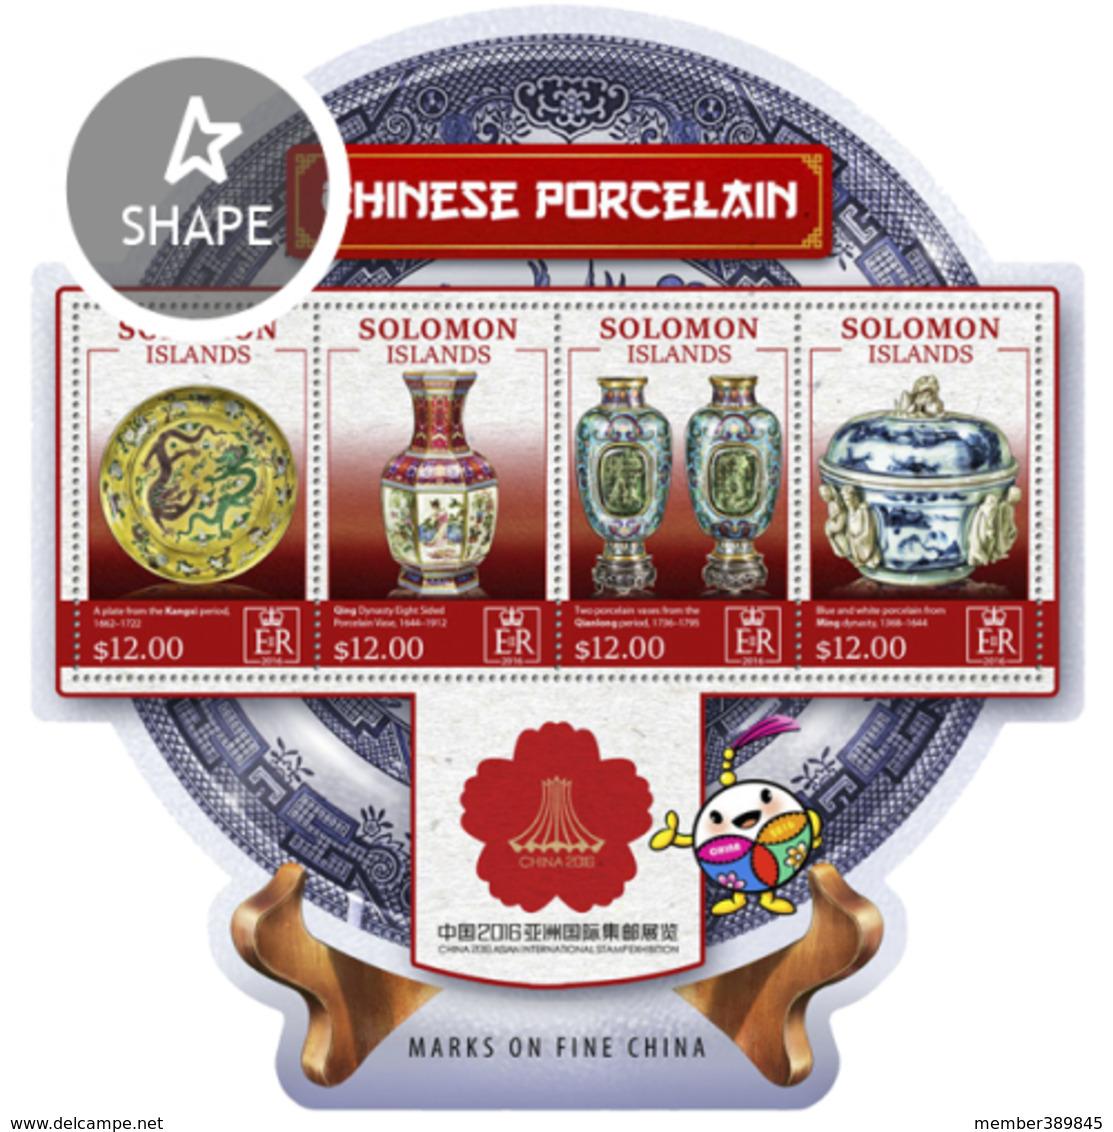 SOLOMON ISLANDS - 2016 - Chinese Porcelain, China International Stamp Exhibition - Perf 4v Sheet - M N H - Solomon Islands (1978-...)